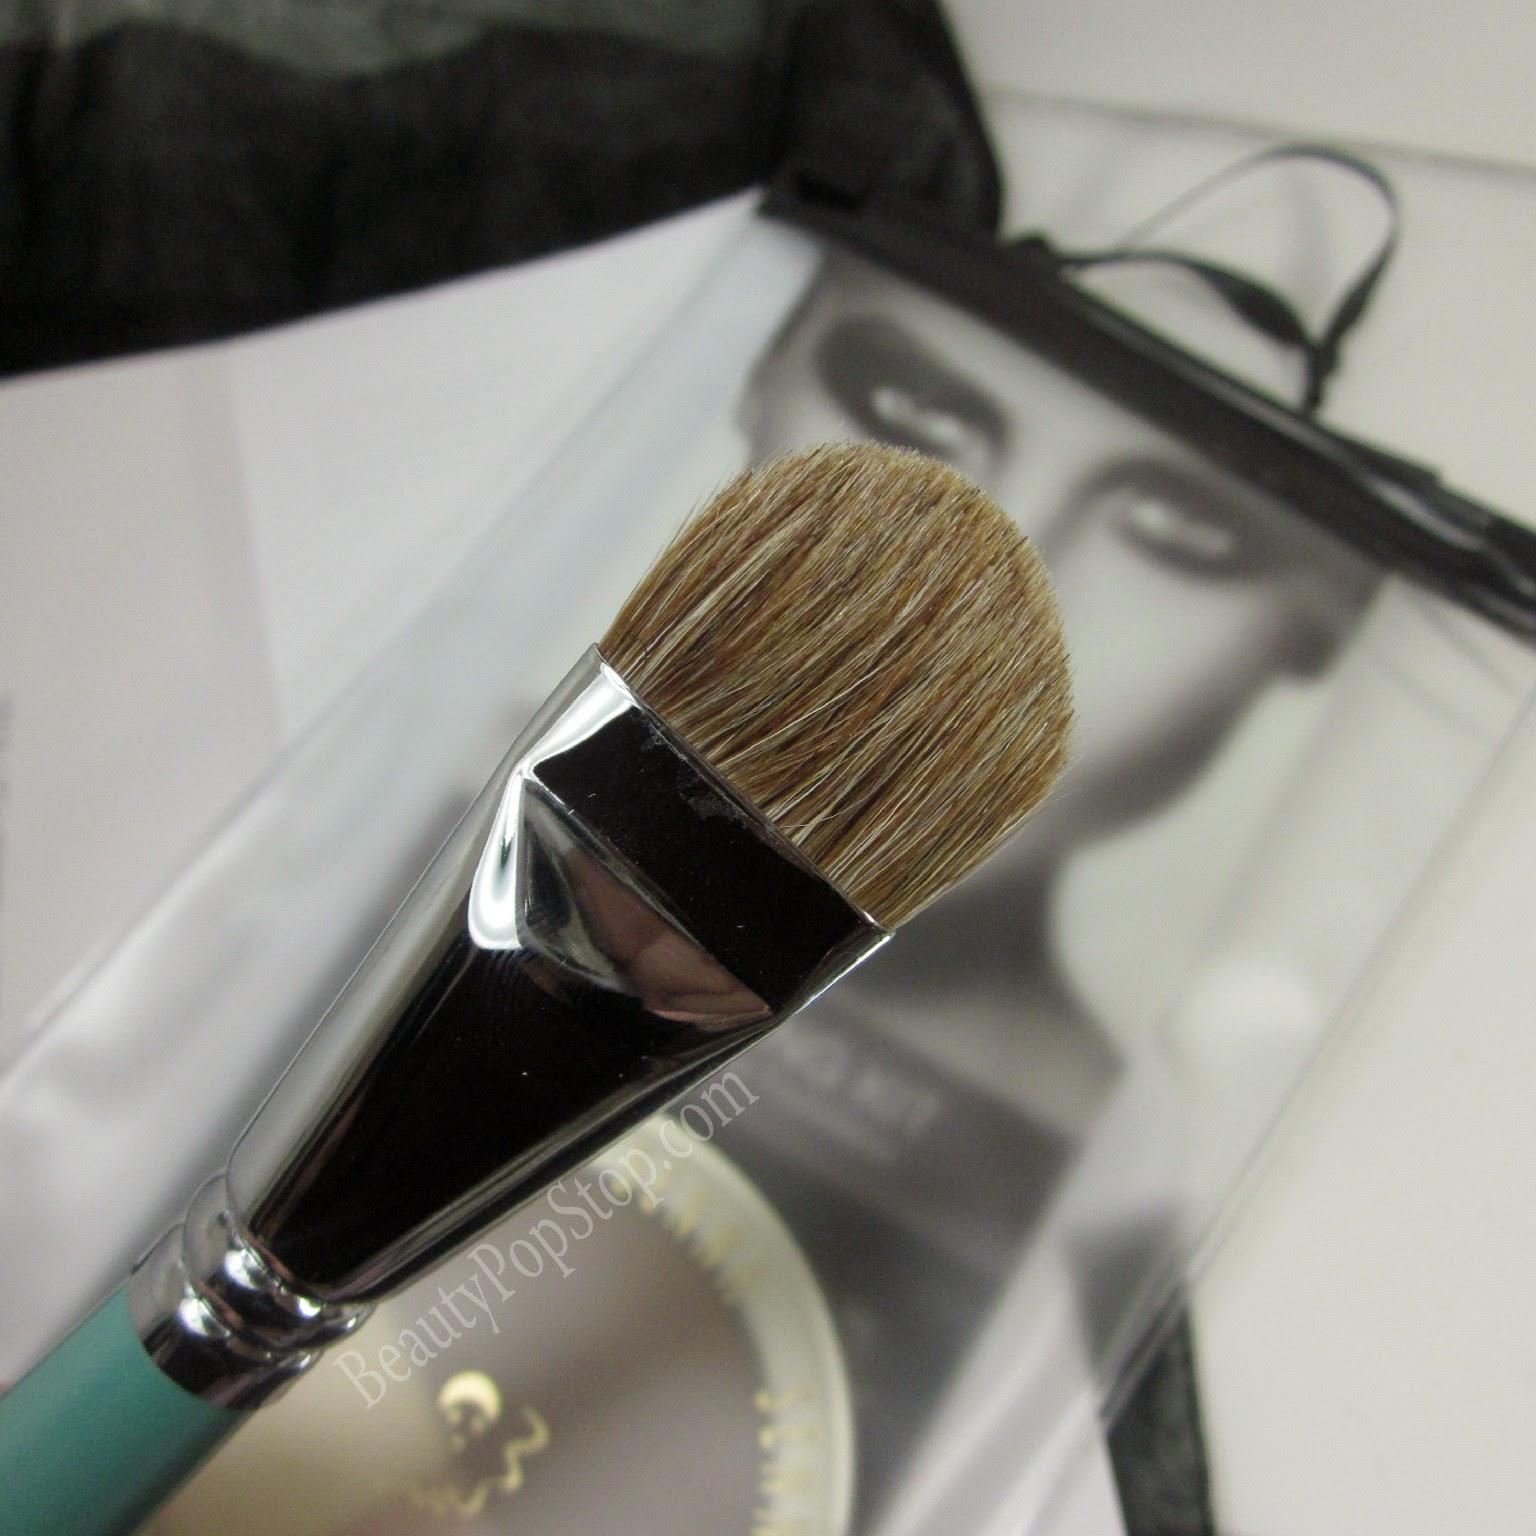 senna foundation 20 makeup brush review